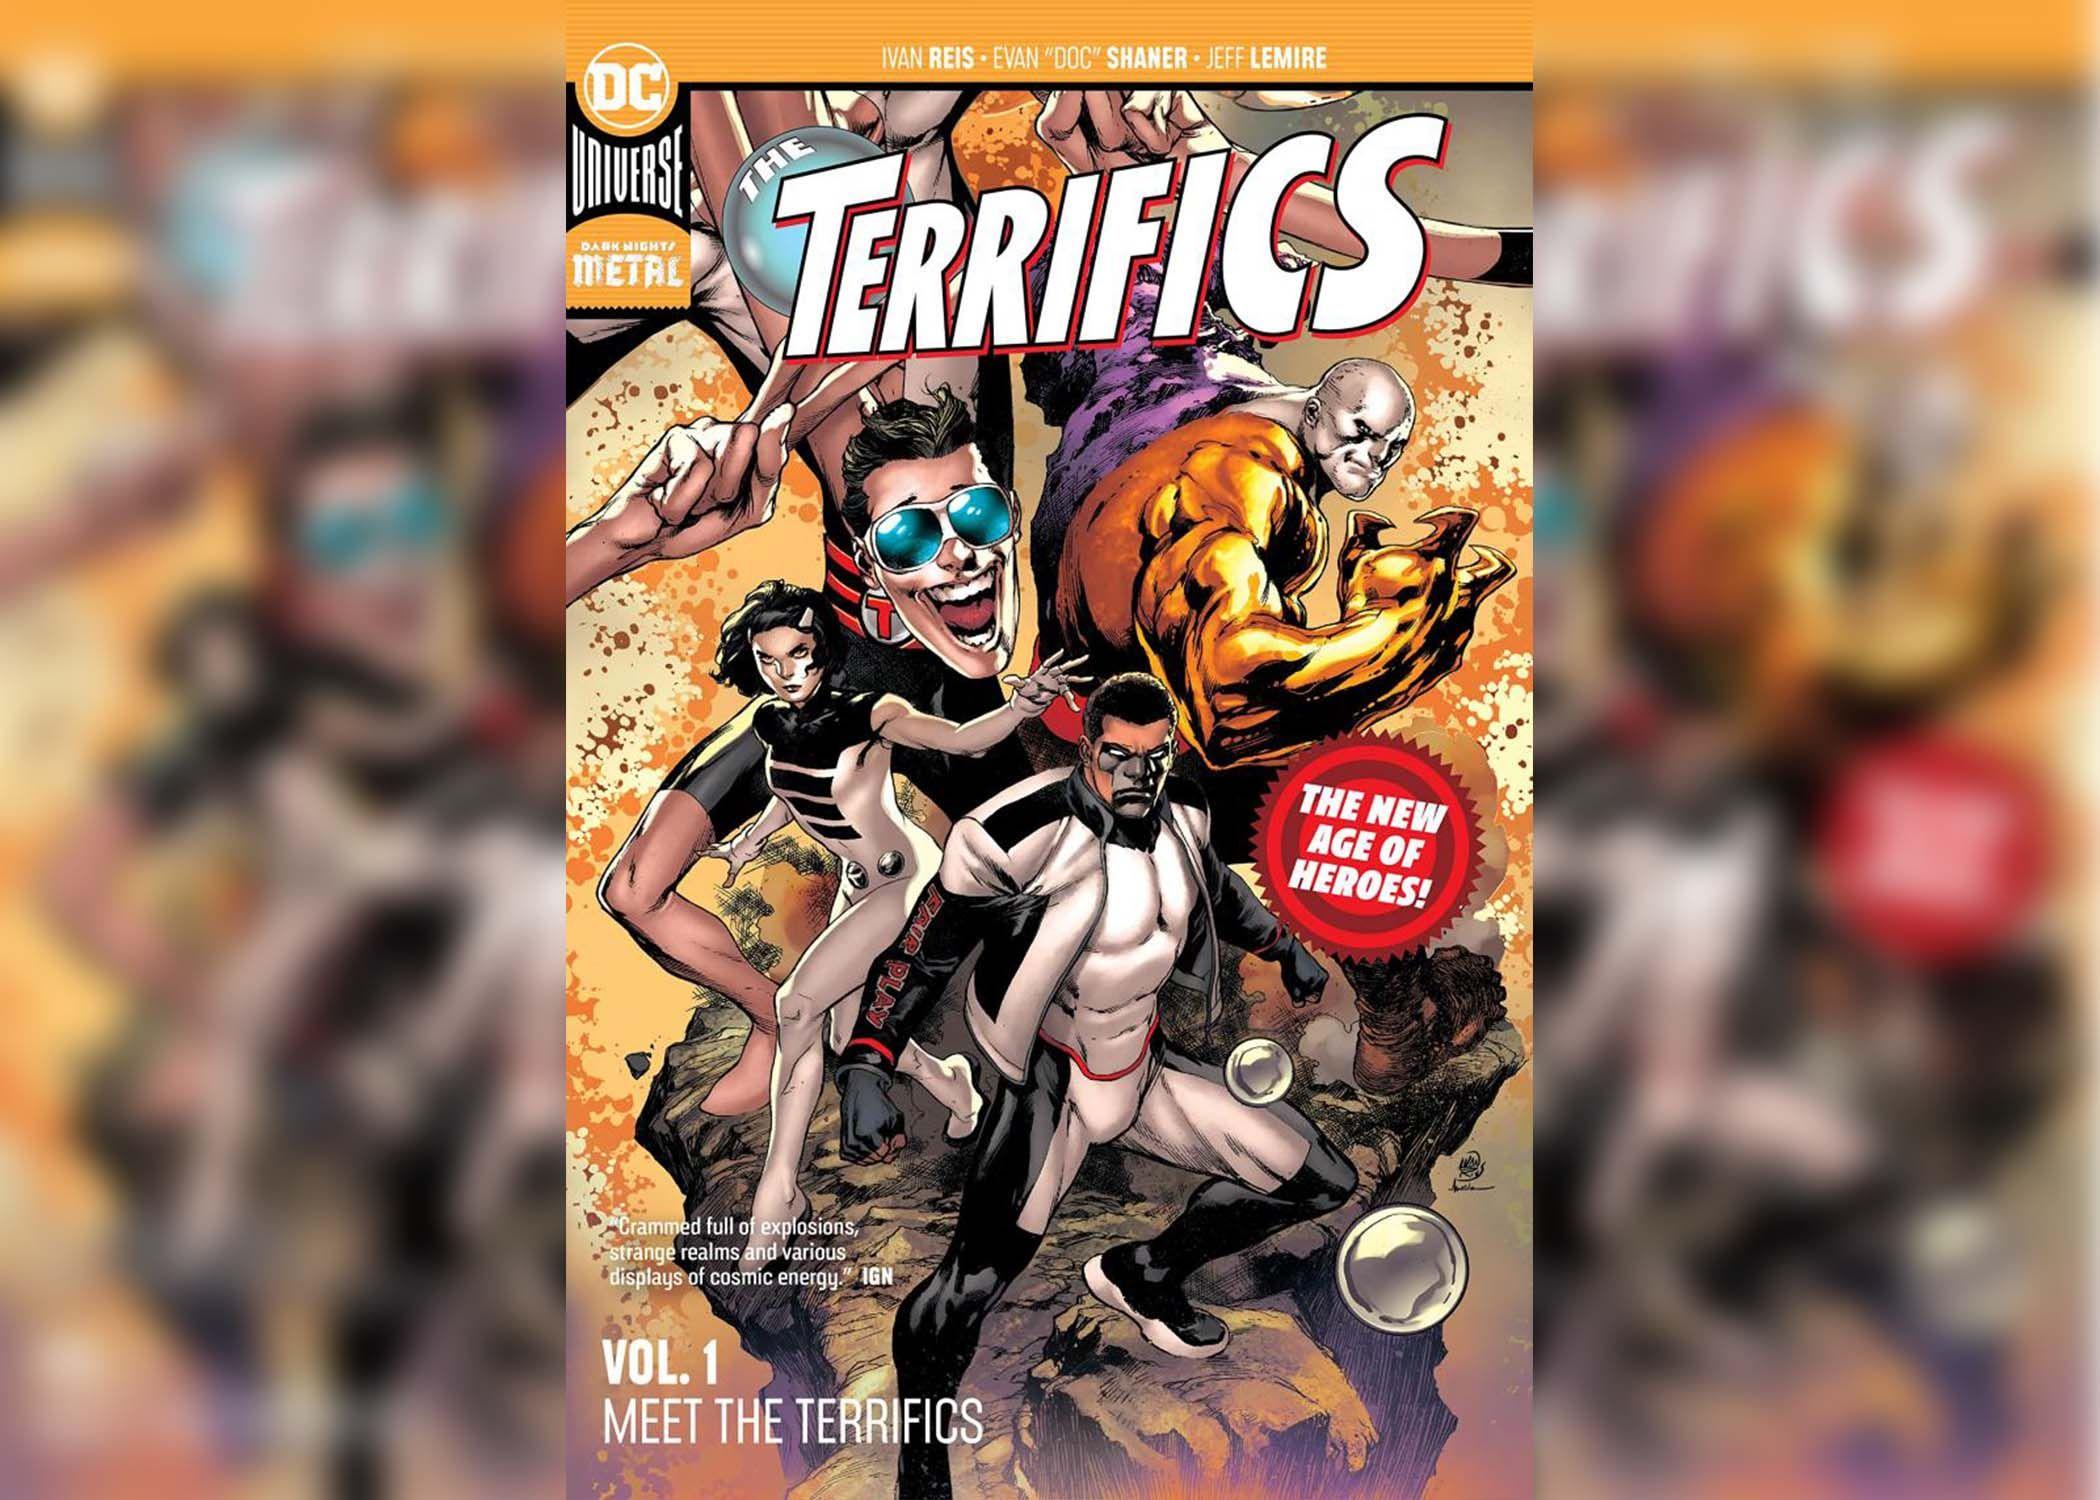 The Terrifics- Meet the Terrifics 1